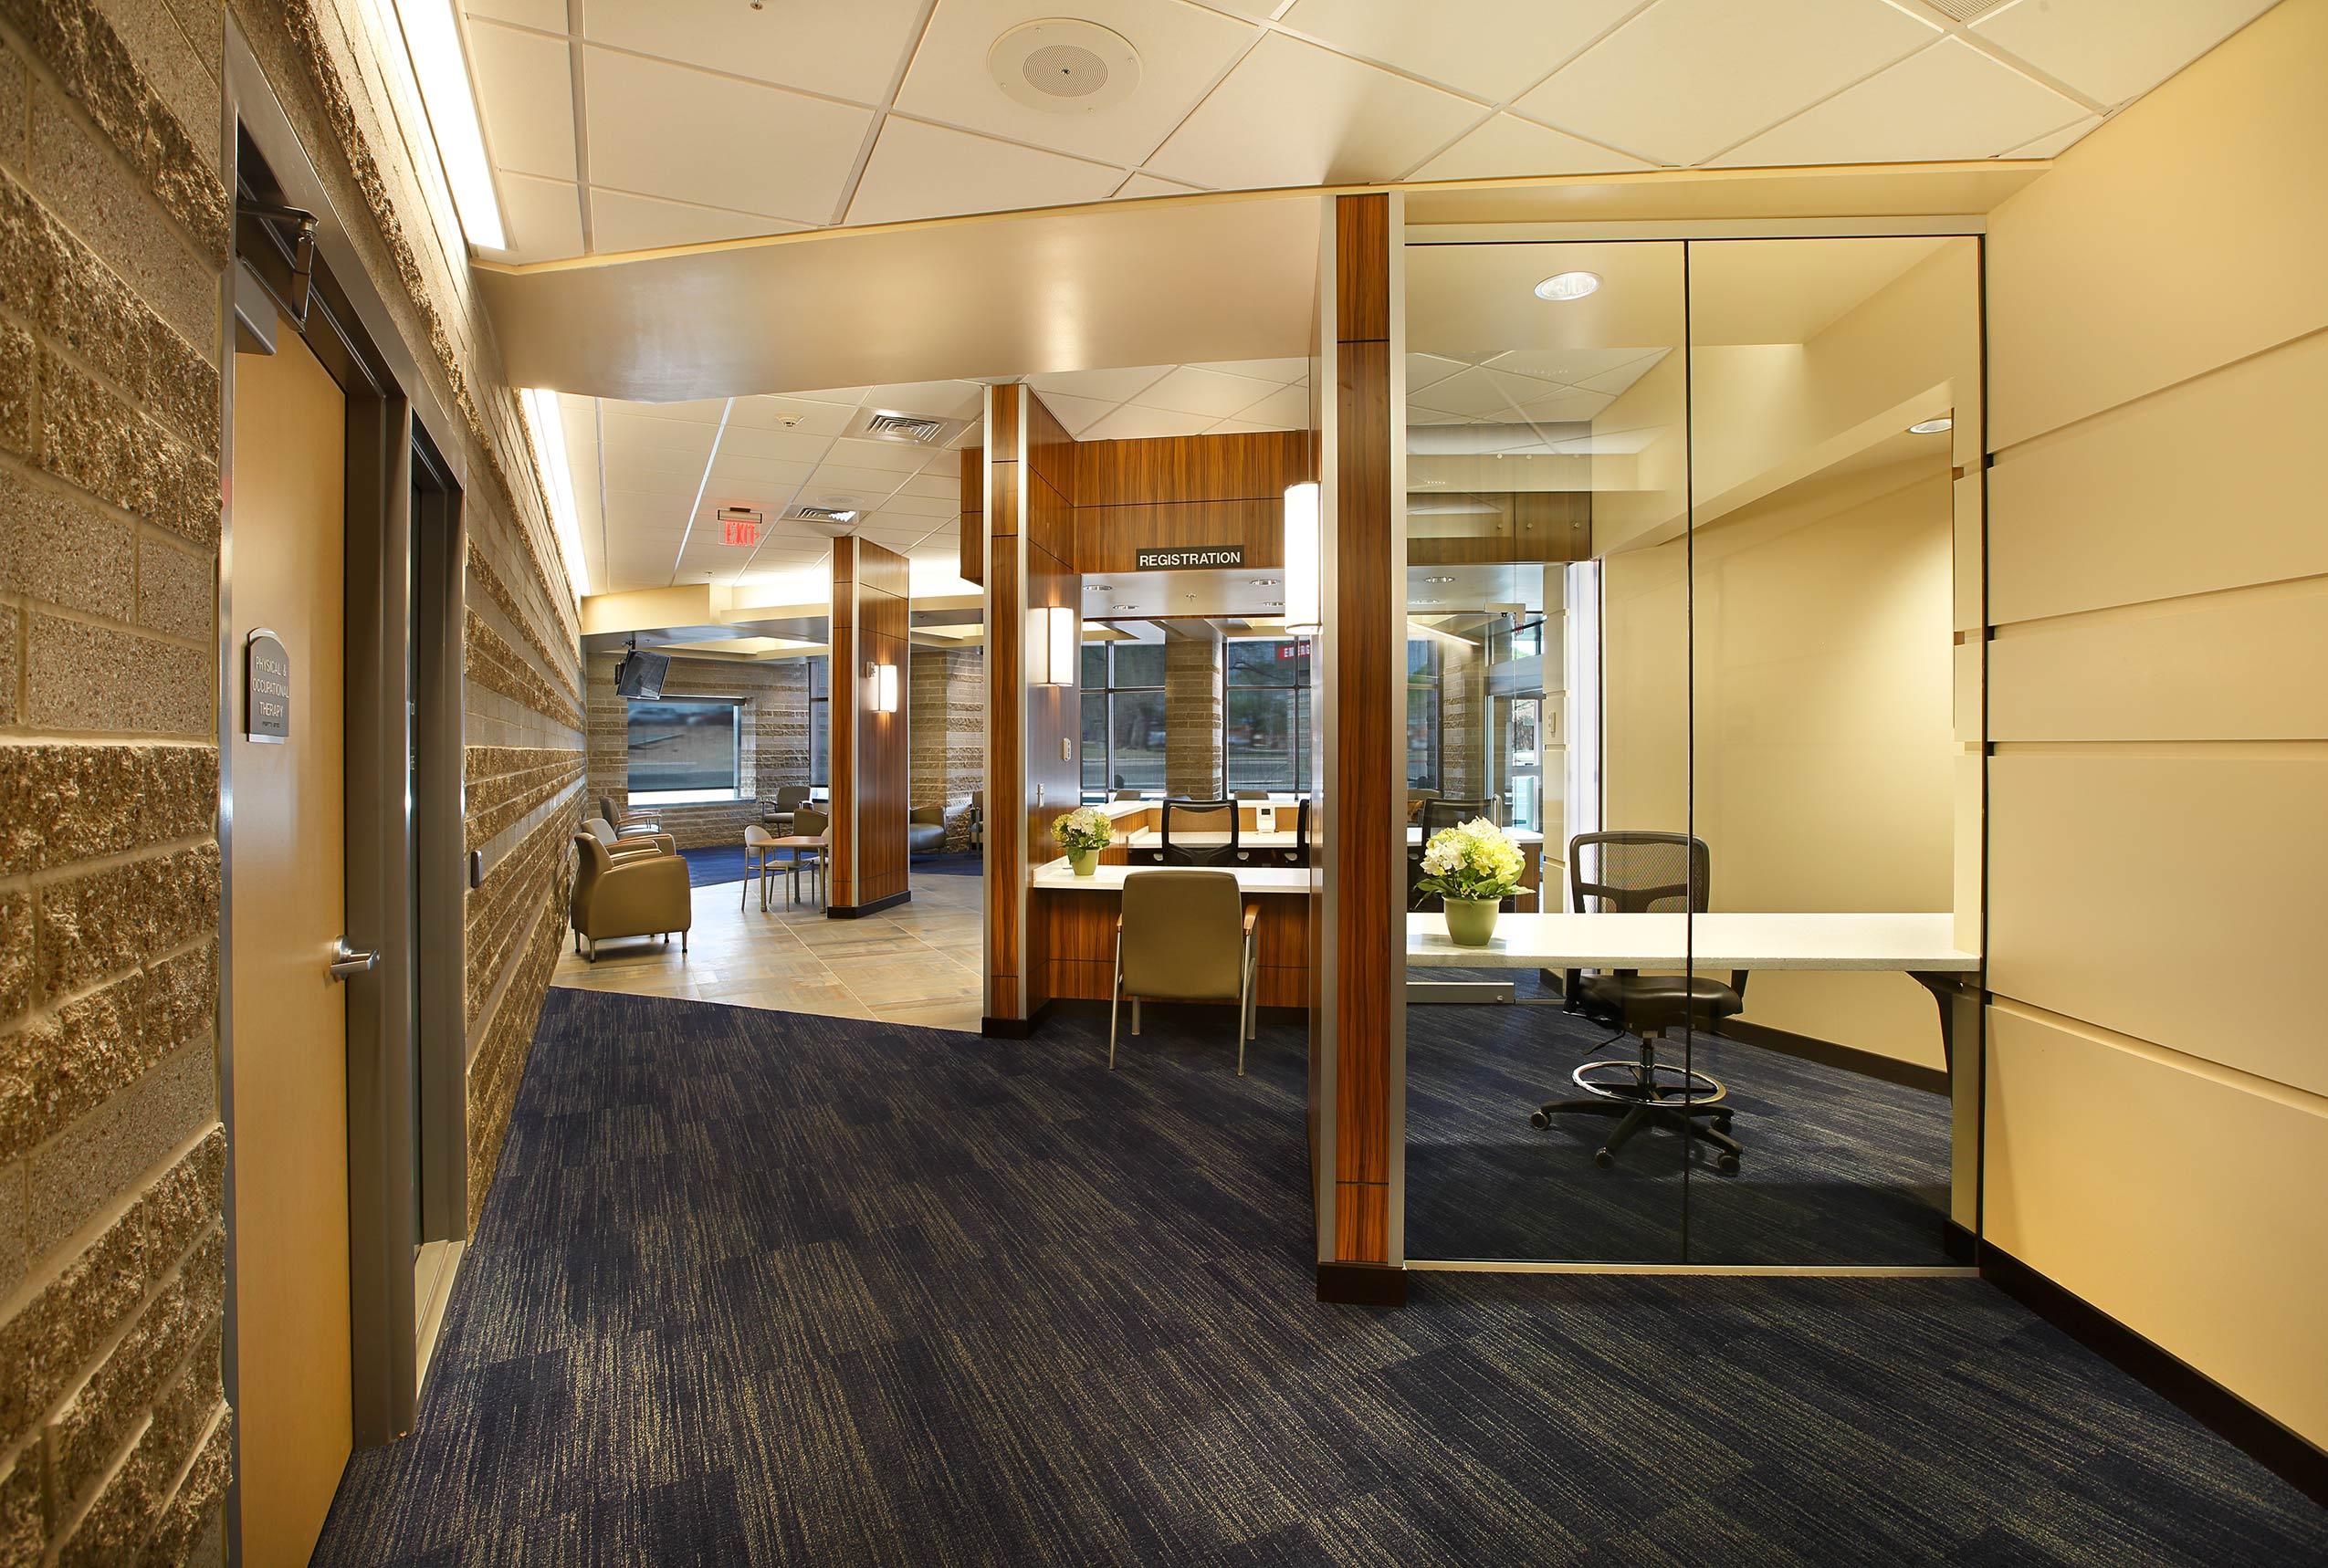 Uintah Basin Medical Center Hallway Heathcare Architecture